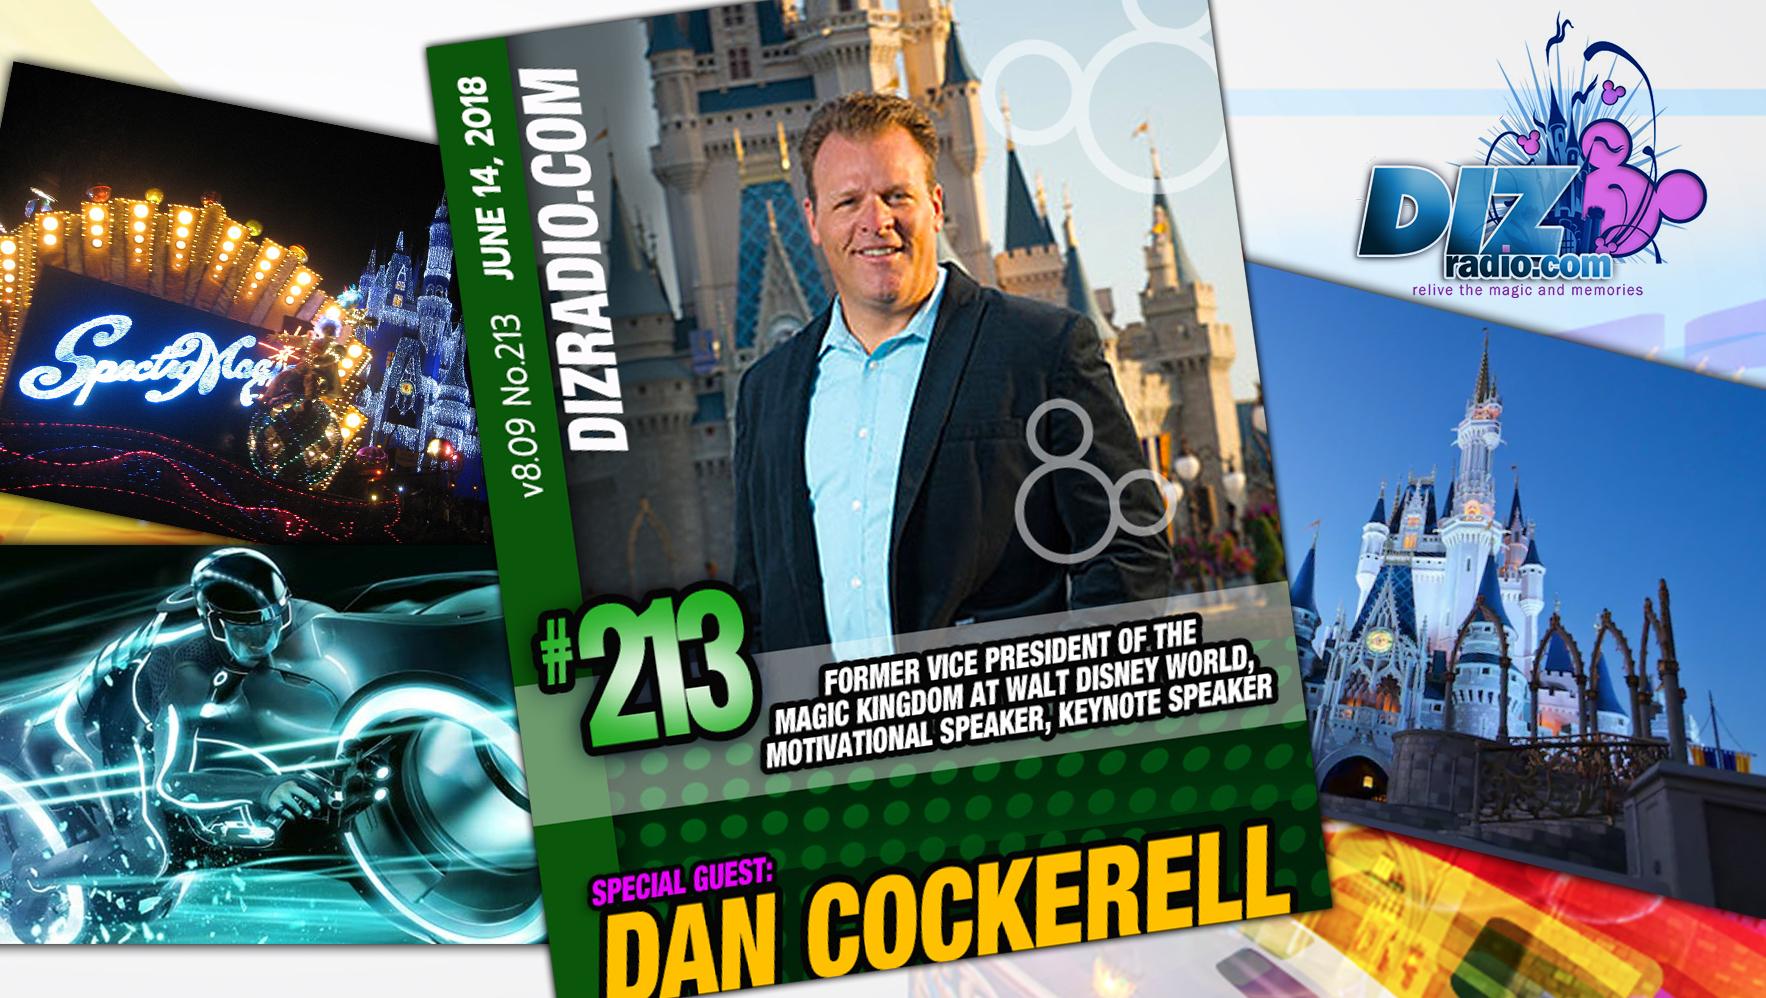 DisneyBlu's DizRadio Disney on Demand Show #213 w/ Special Guest: DAN COCKERELL (Former Vice President of the Magic Kingdom at Walt Disney World, Motivational Speaker, Keynote Speaker)